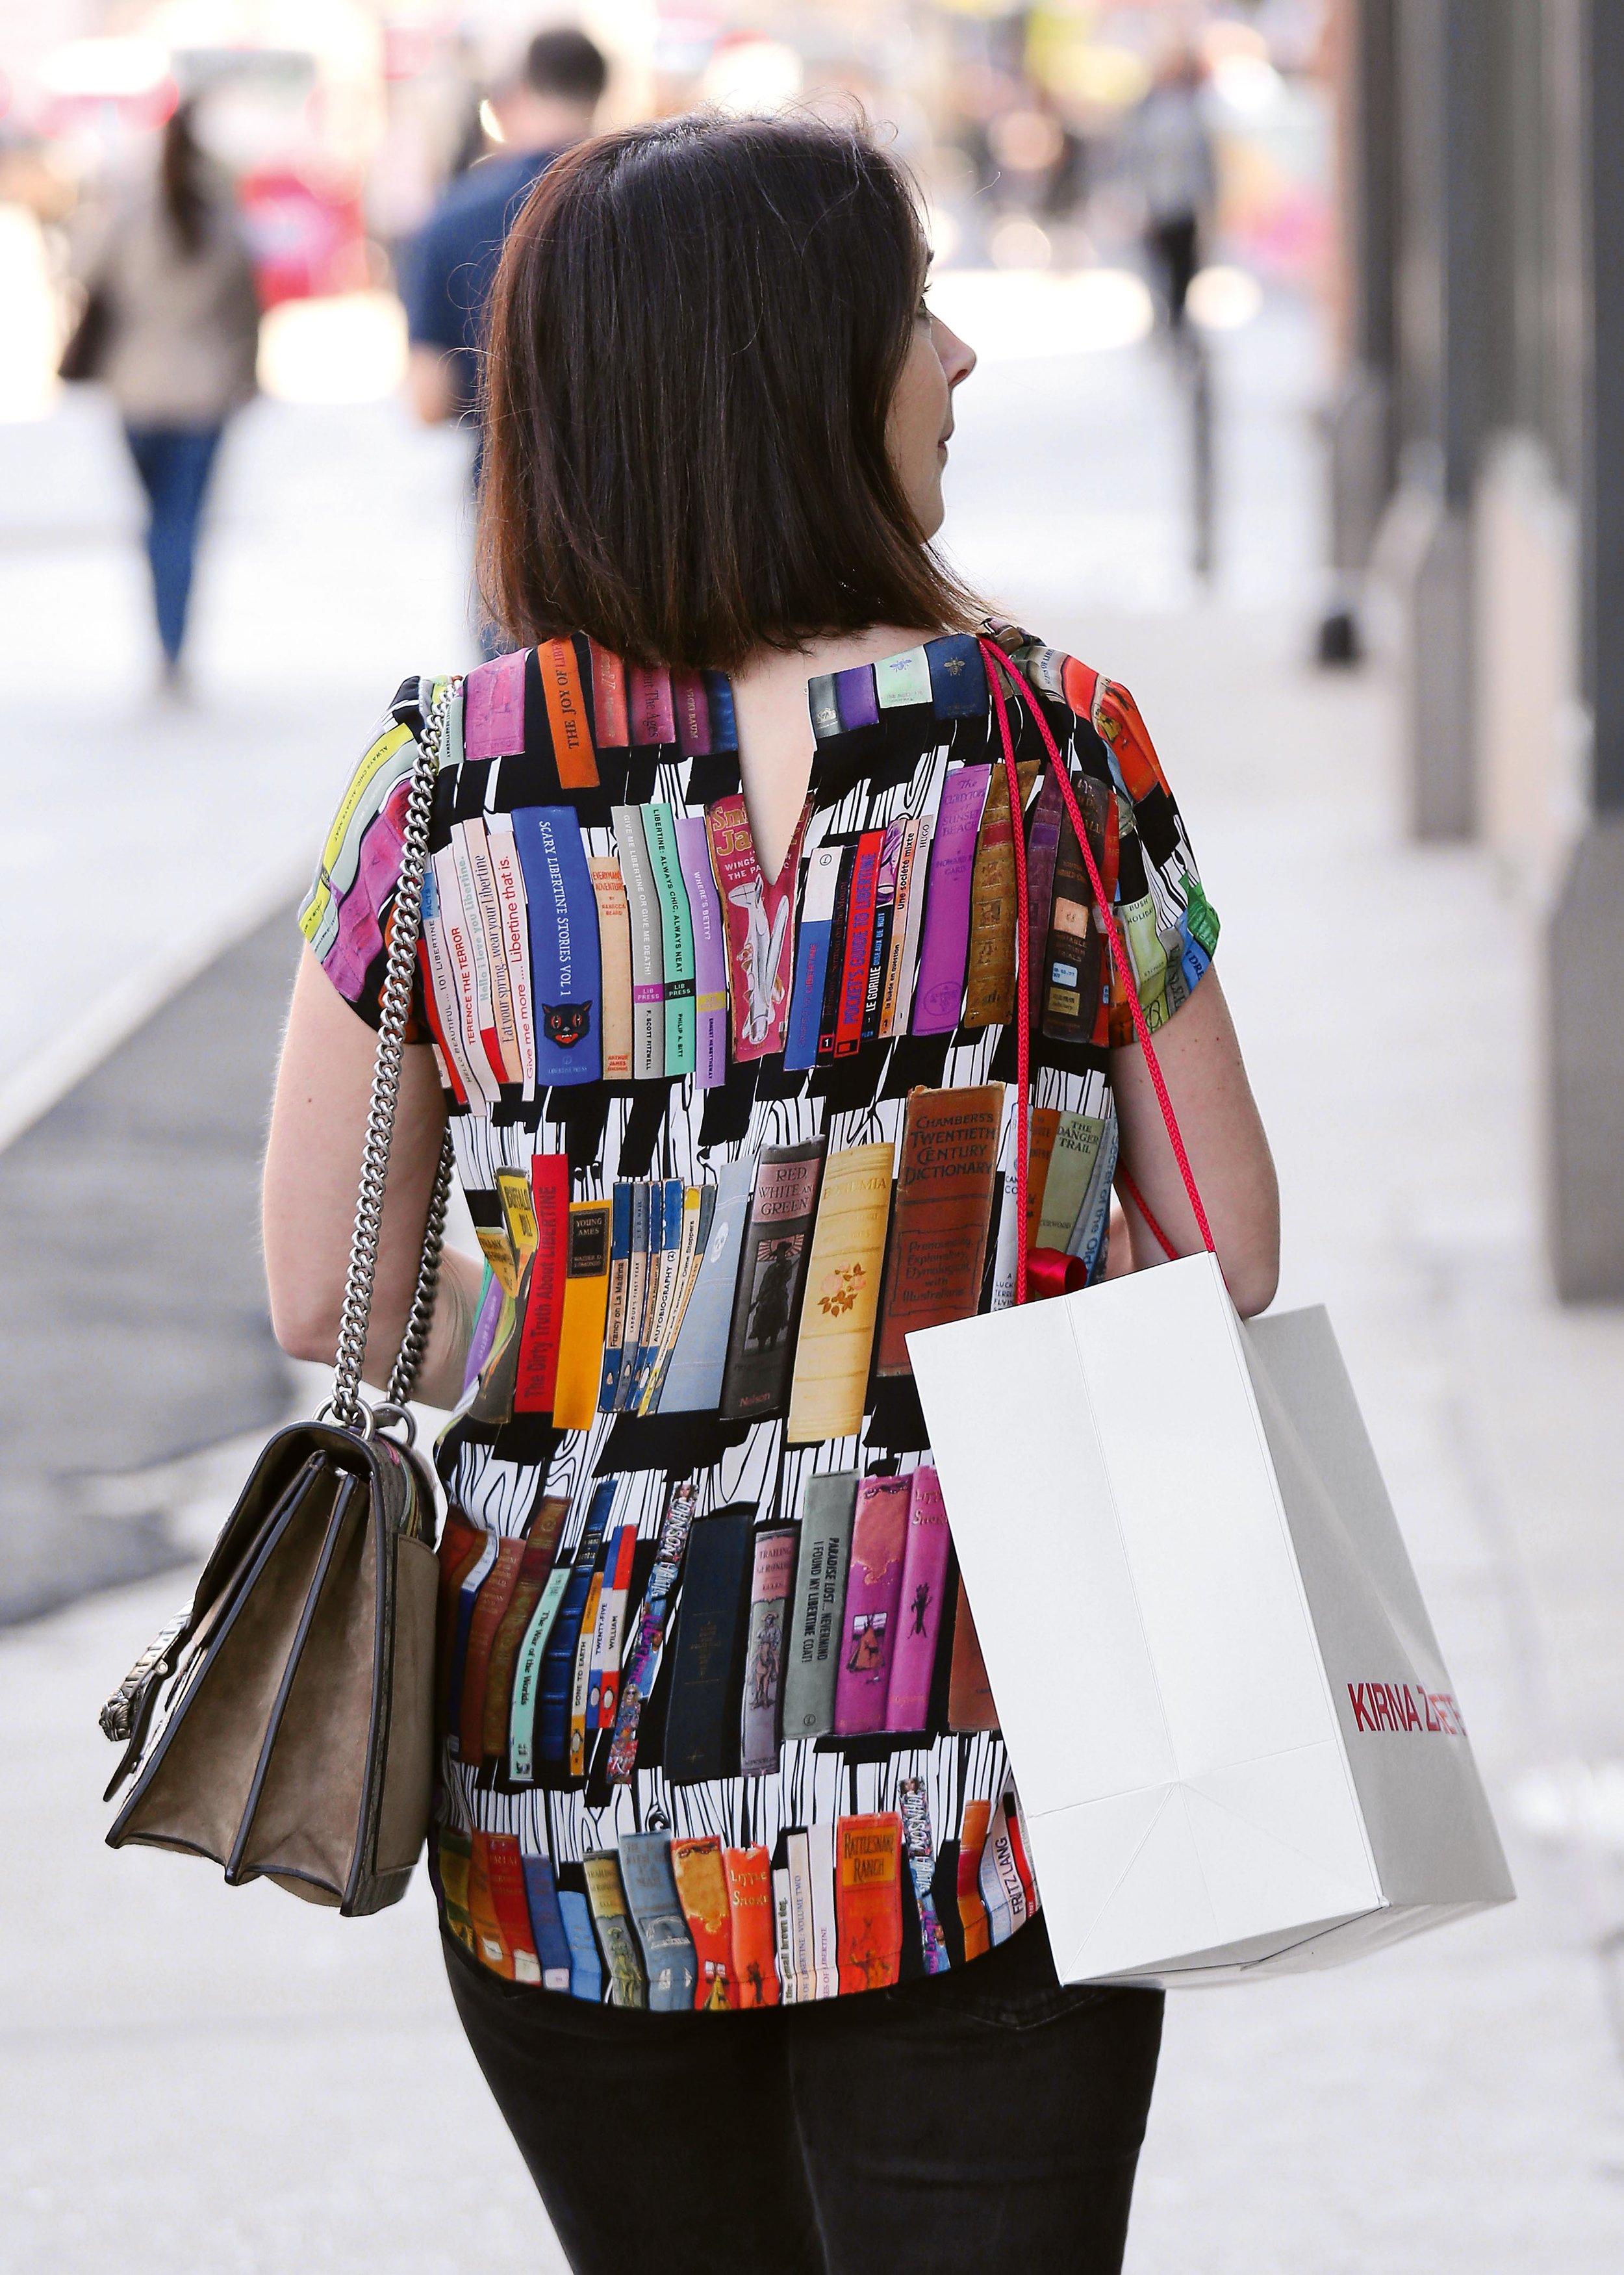 Book Blouse, Lafayette Street, NYC, 2016 © Lawrence Schwartzwald